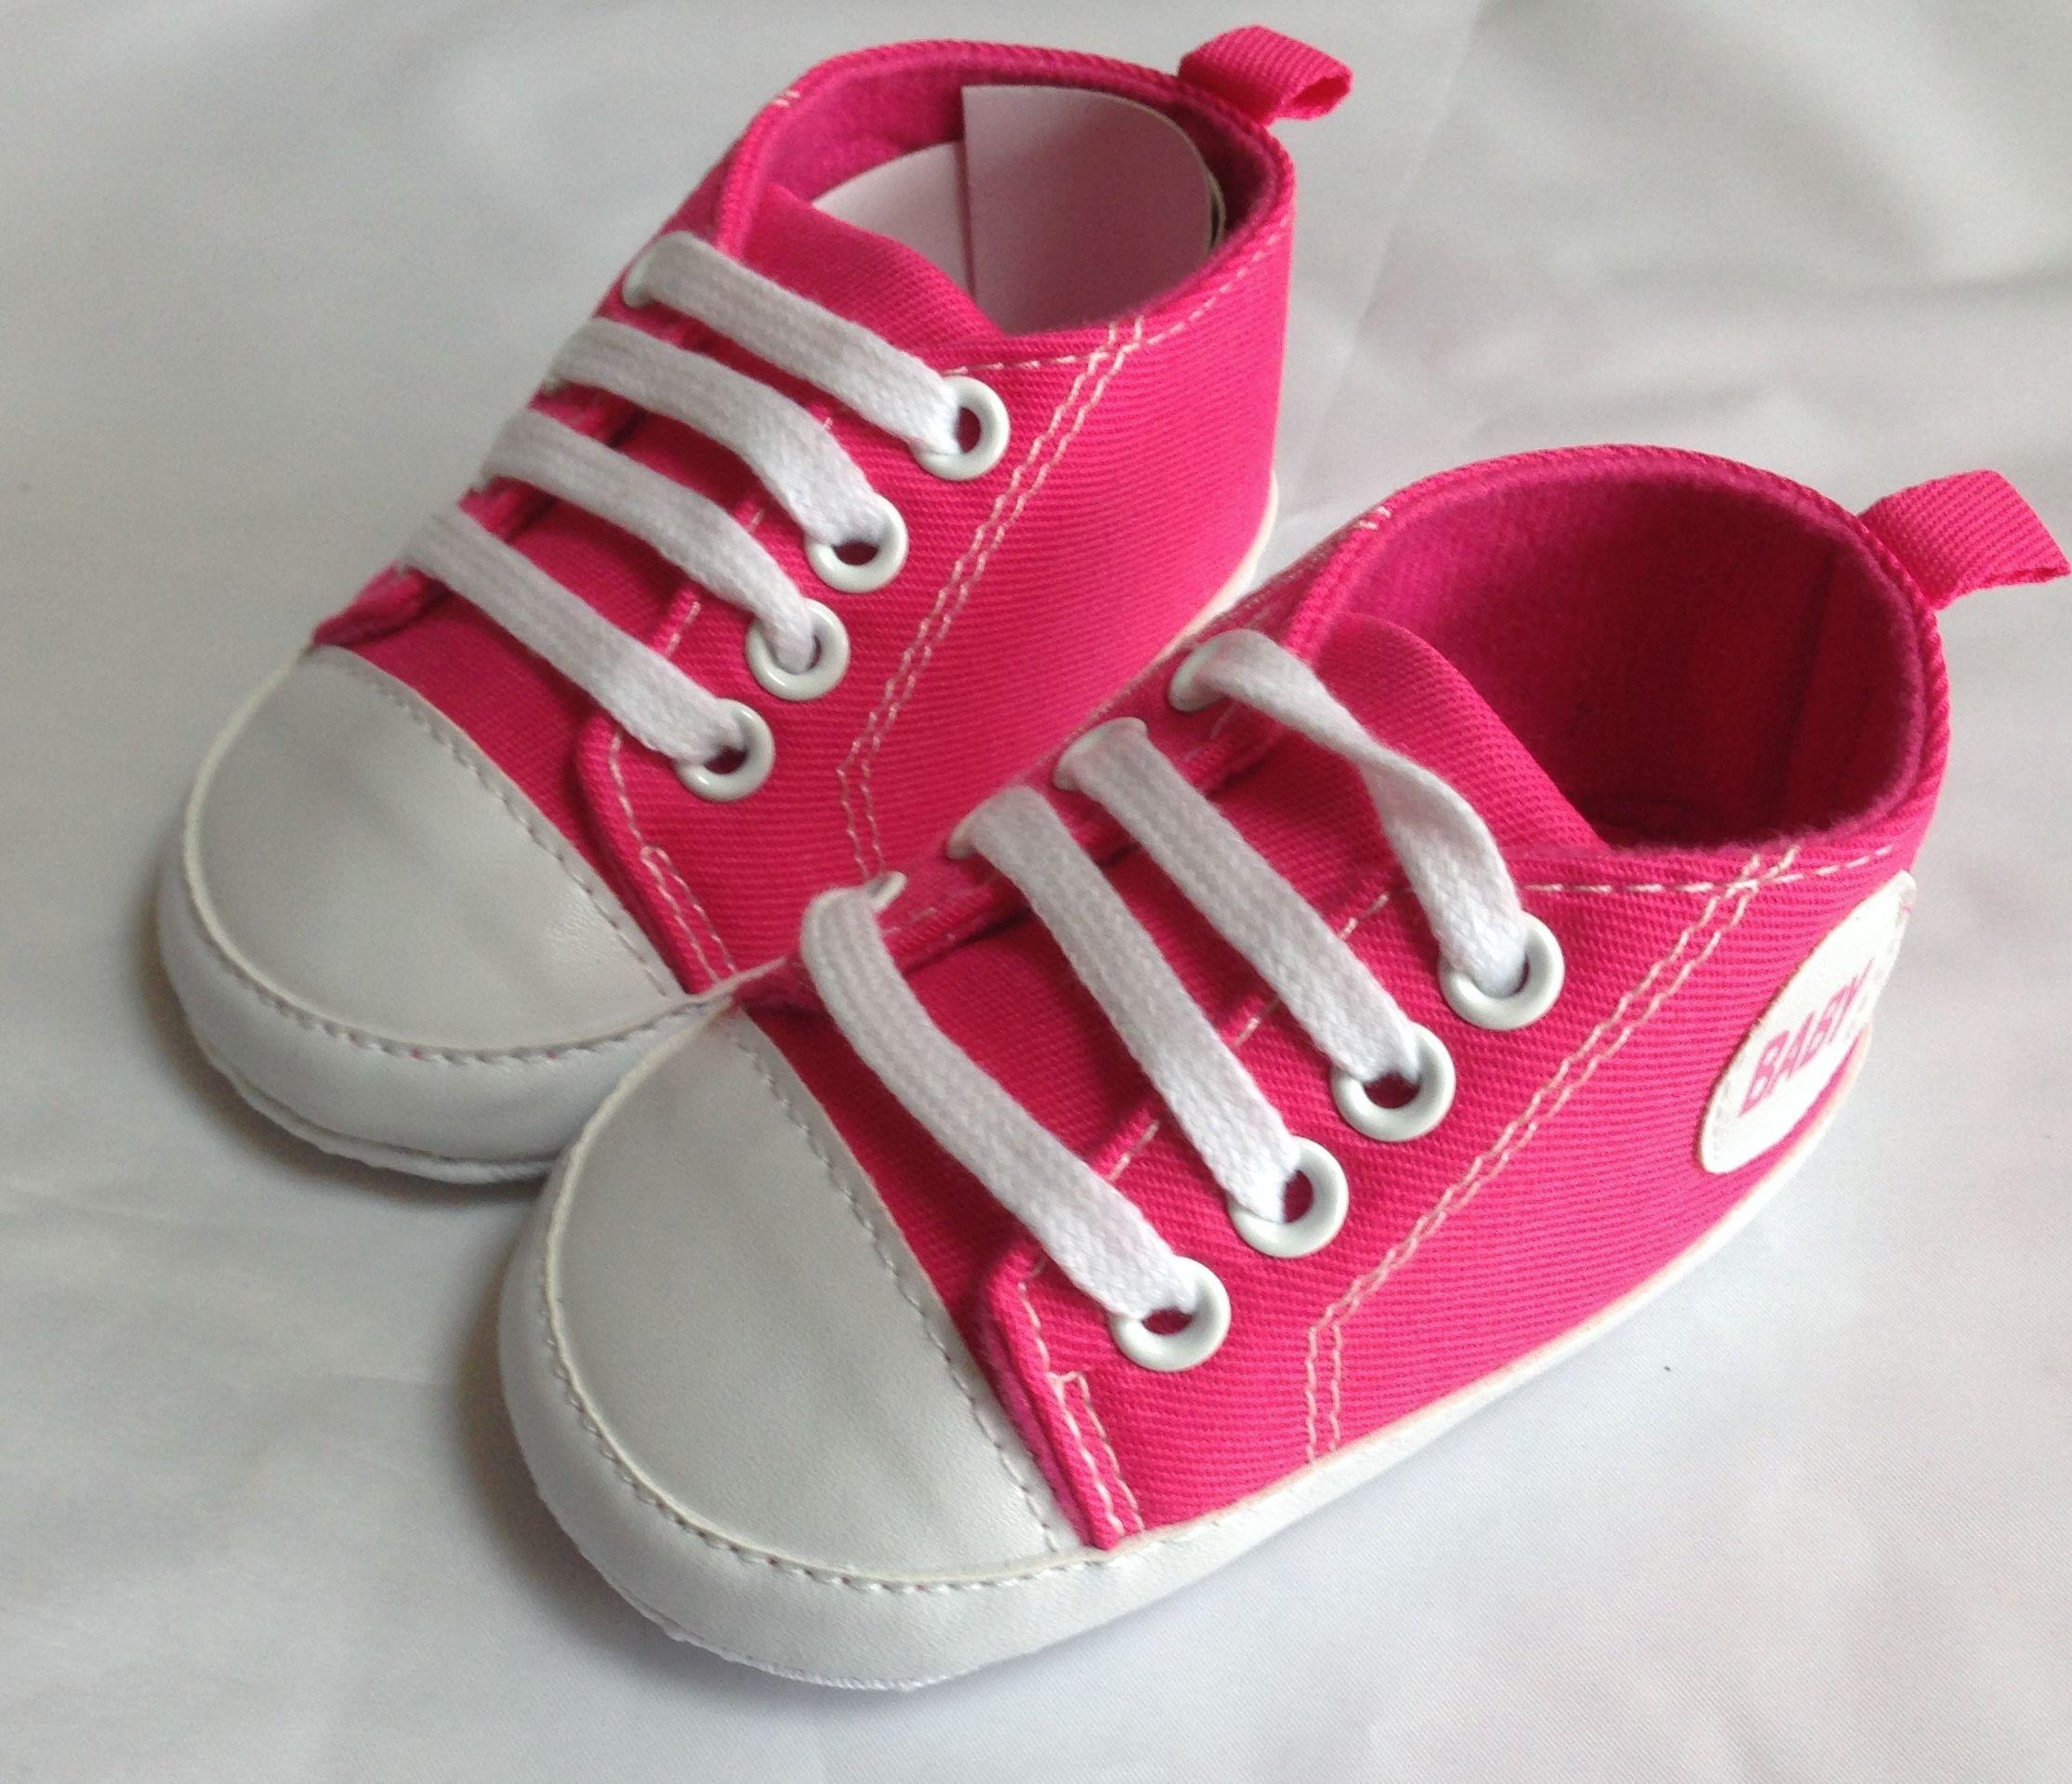 stoere baby sneakers